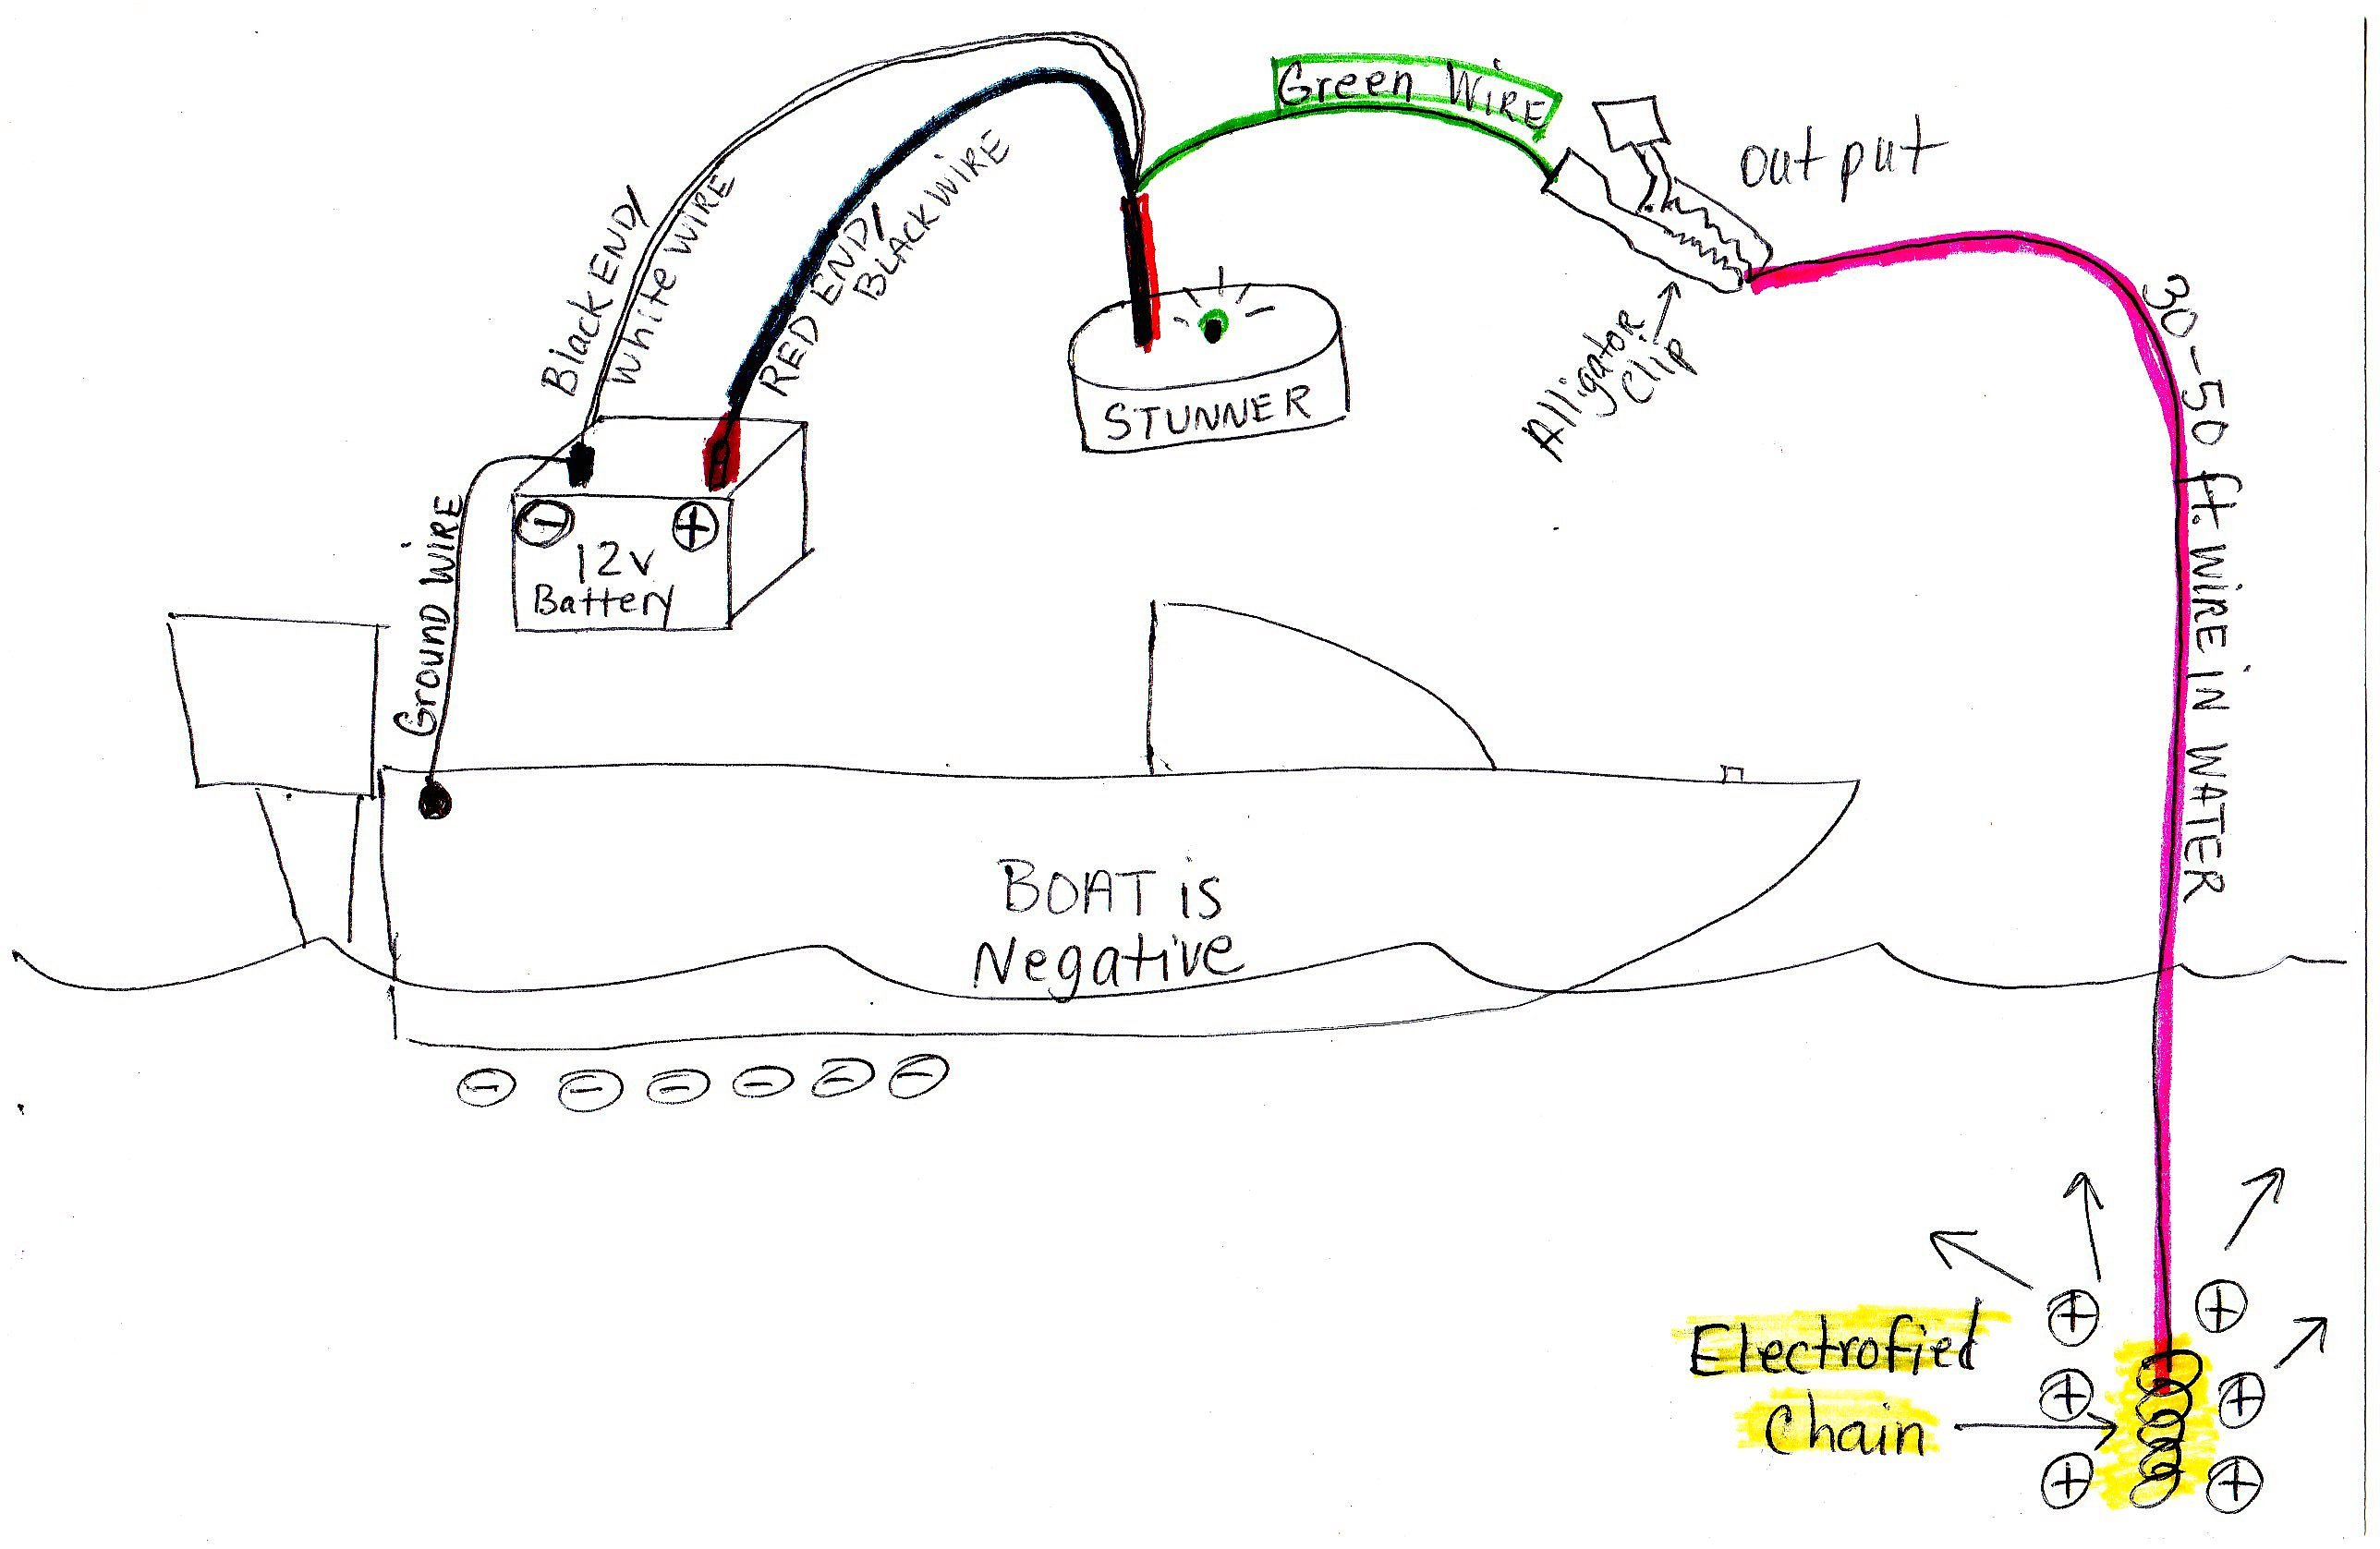 building a koi pond diagram simple wiring of car www catfishstunner com fish shocker catfish stunner